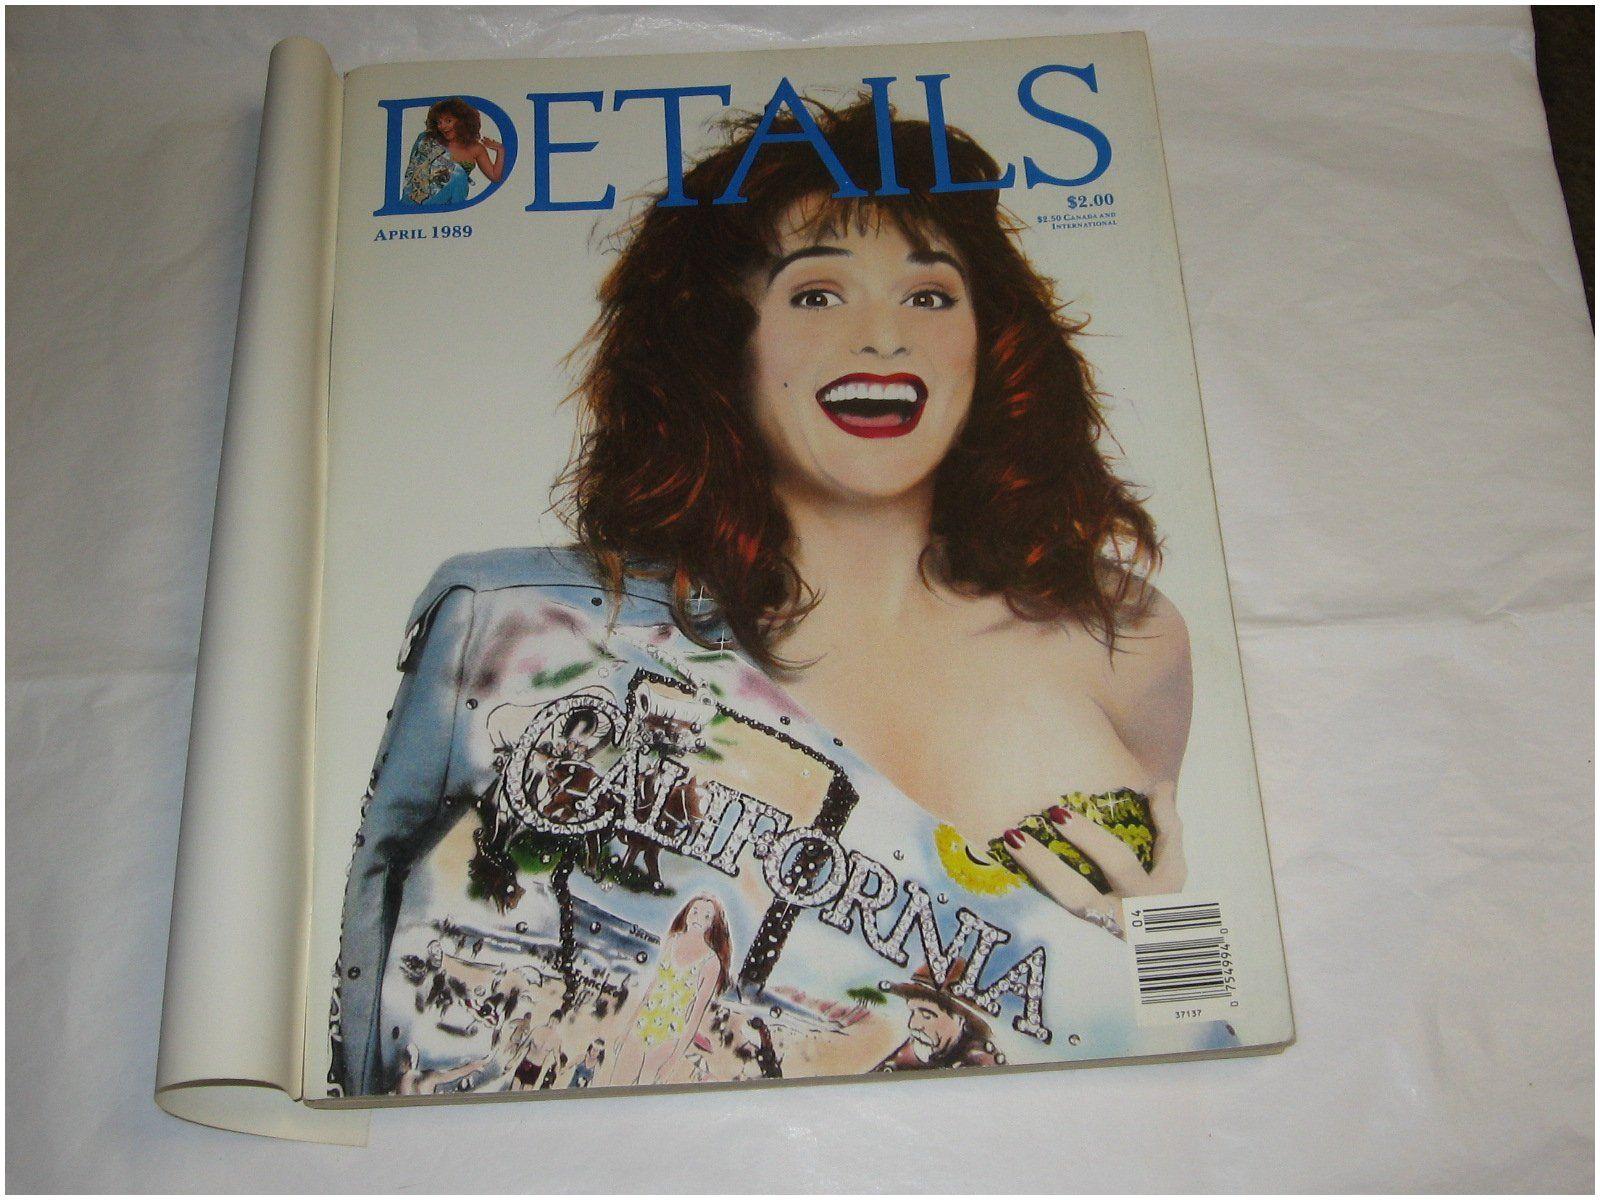 Details Magazine Editors Details Magazine April 1989 Annie Flanders Editor Amazon Books